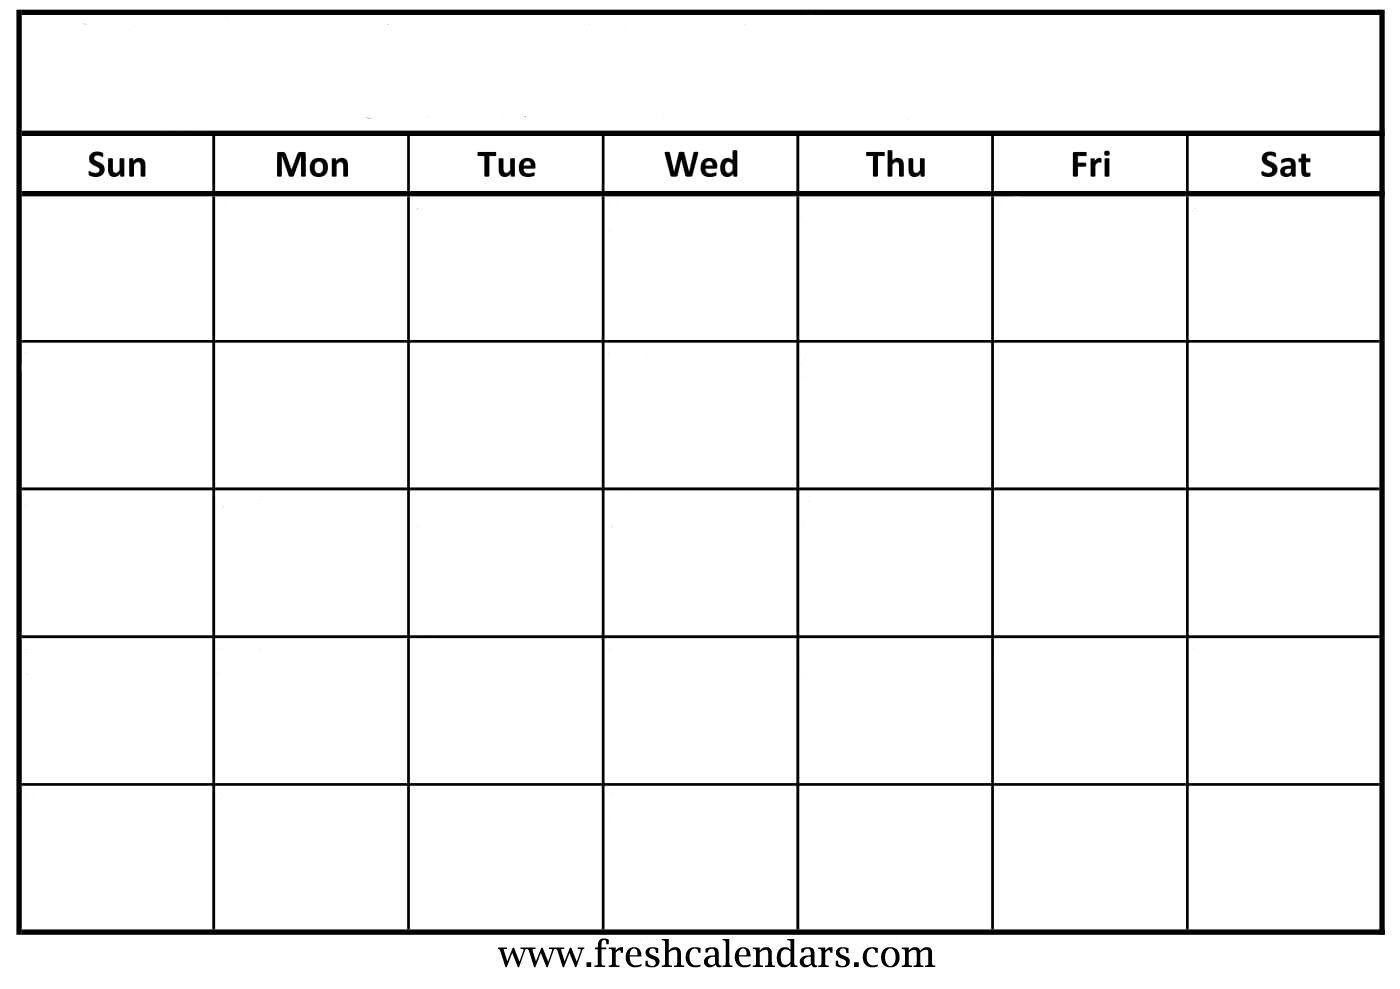 Blank Calendar: Wonderfully Printable 2019 Templates with Free Printable Blank Calendars